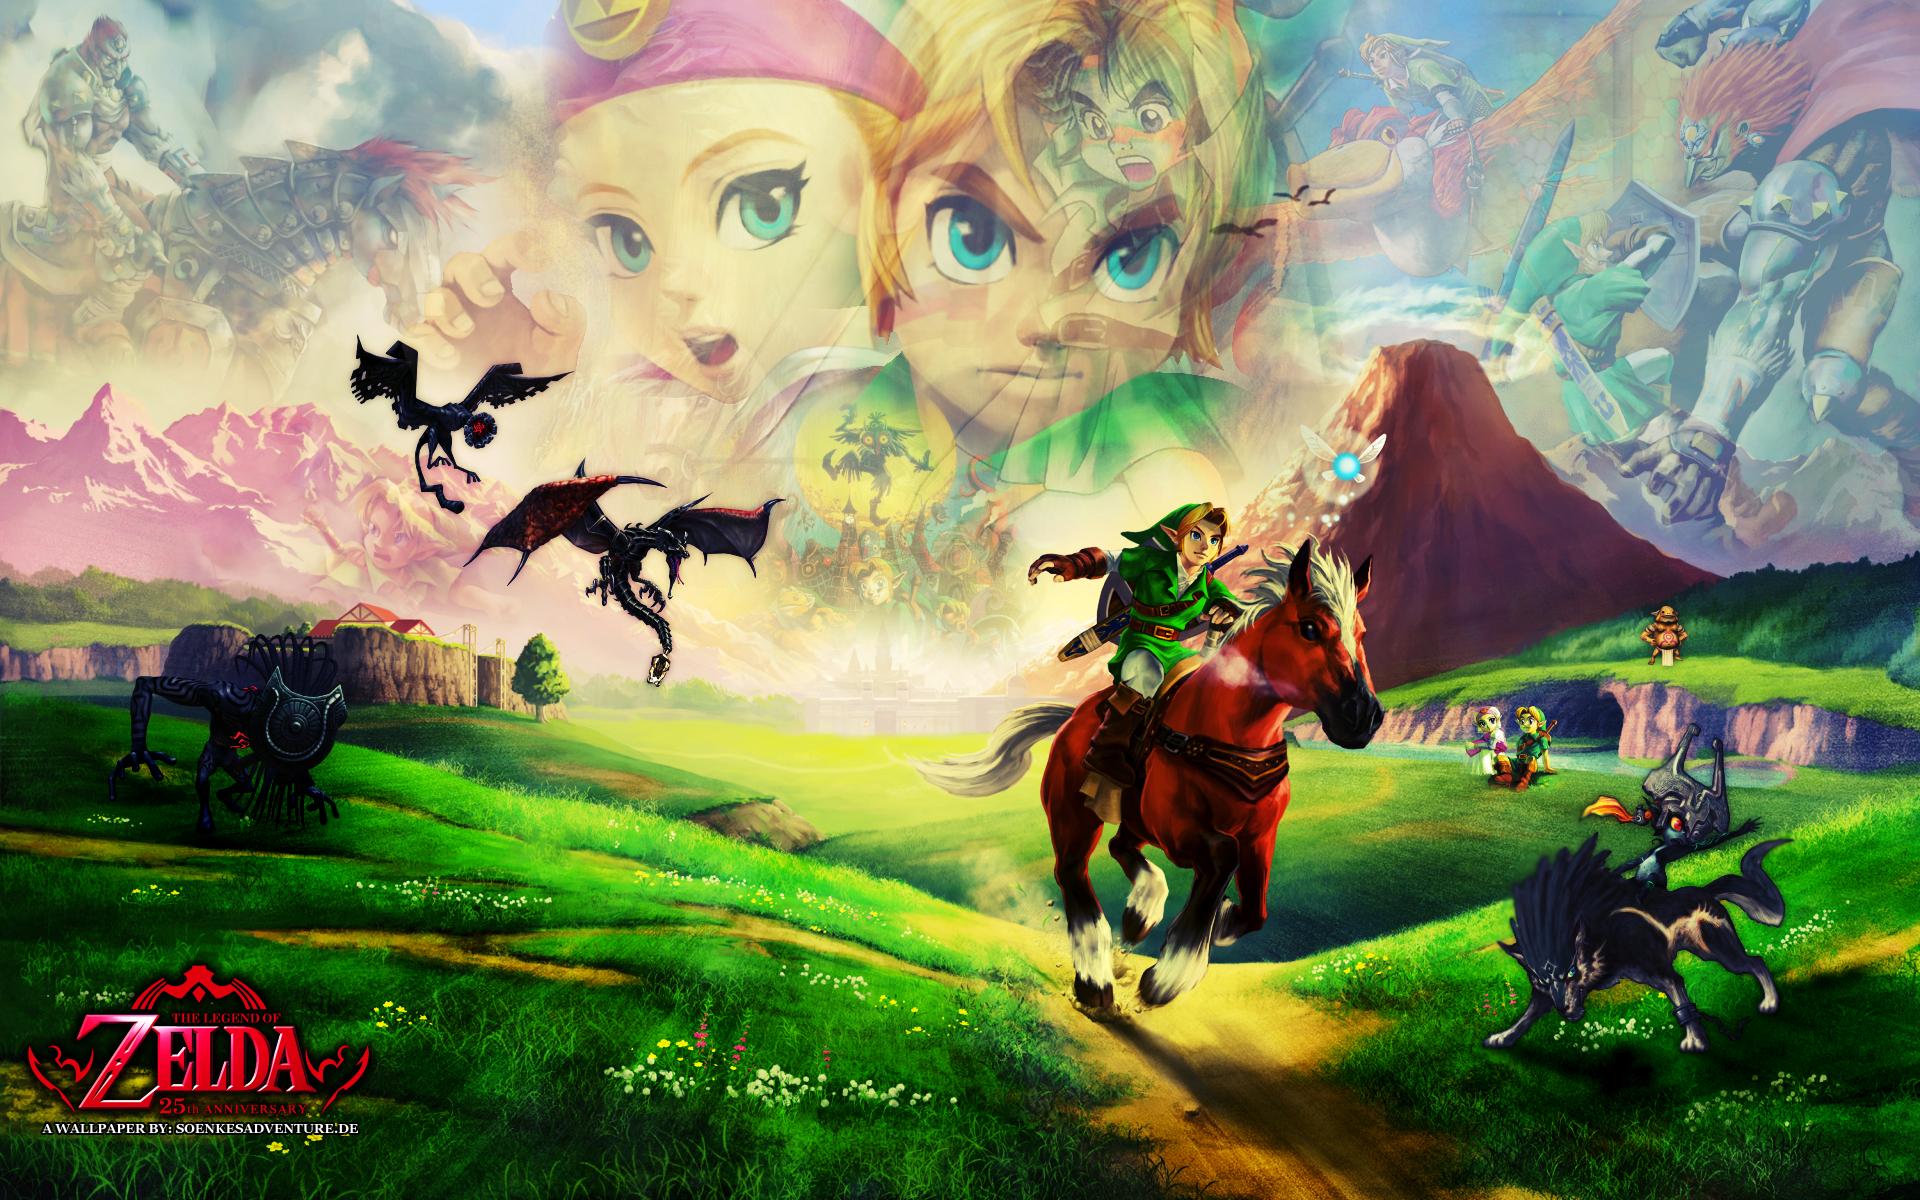 Legend Of Zelda Ocarina Of Time Wallpapers For Android For Desktop Wallpaper 1080p